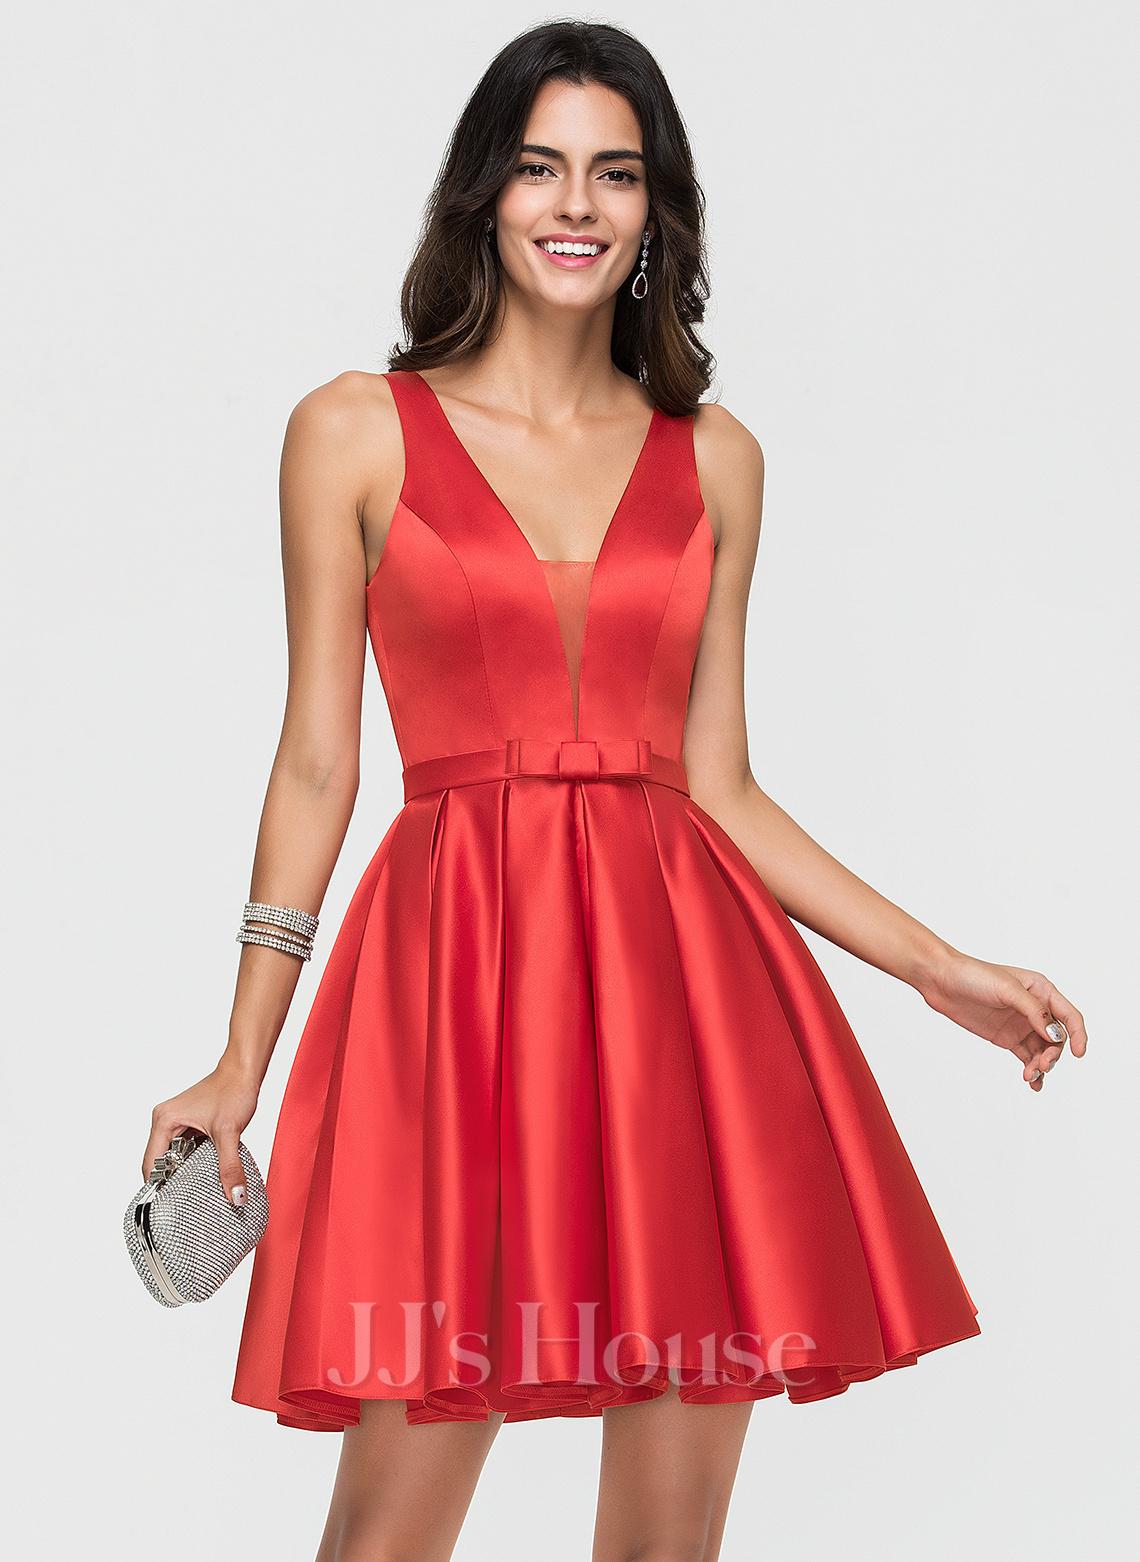 A-Line/Princess V-neck Short/Mini Satin Homecoming Dress With Bow(s)